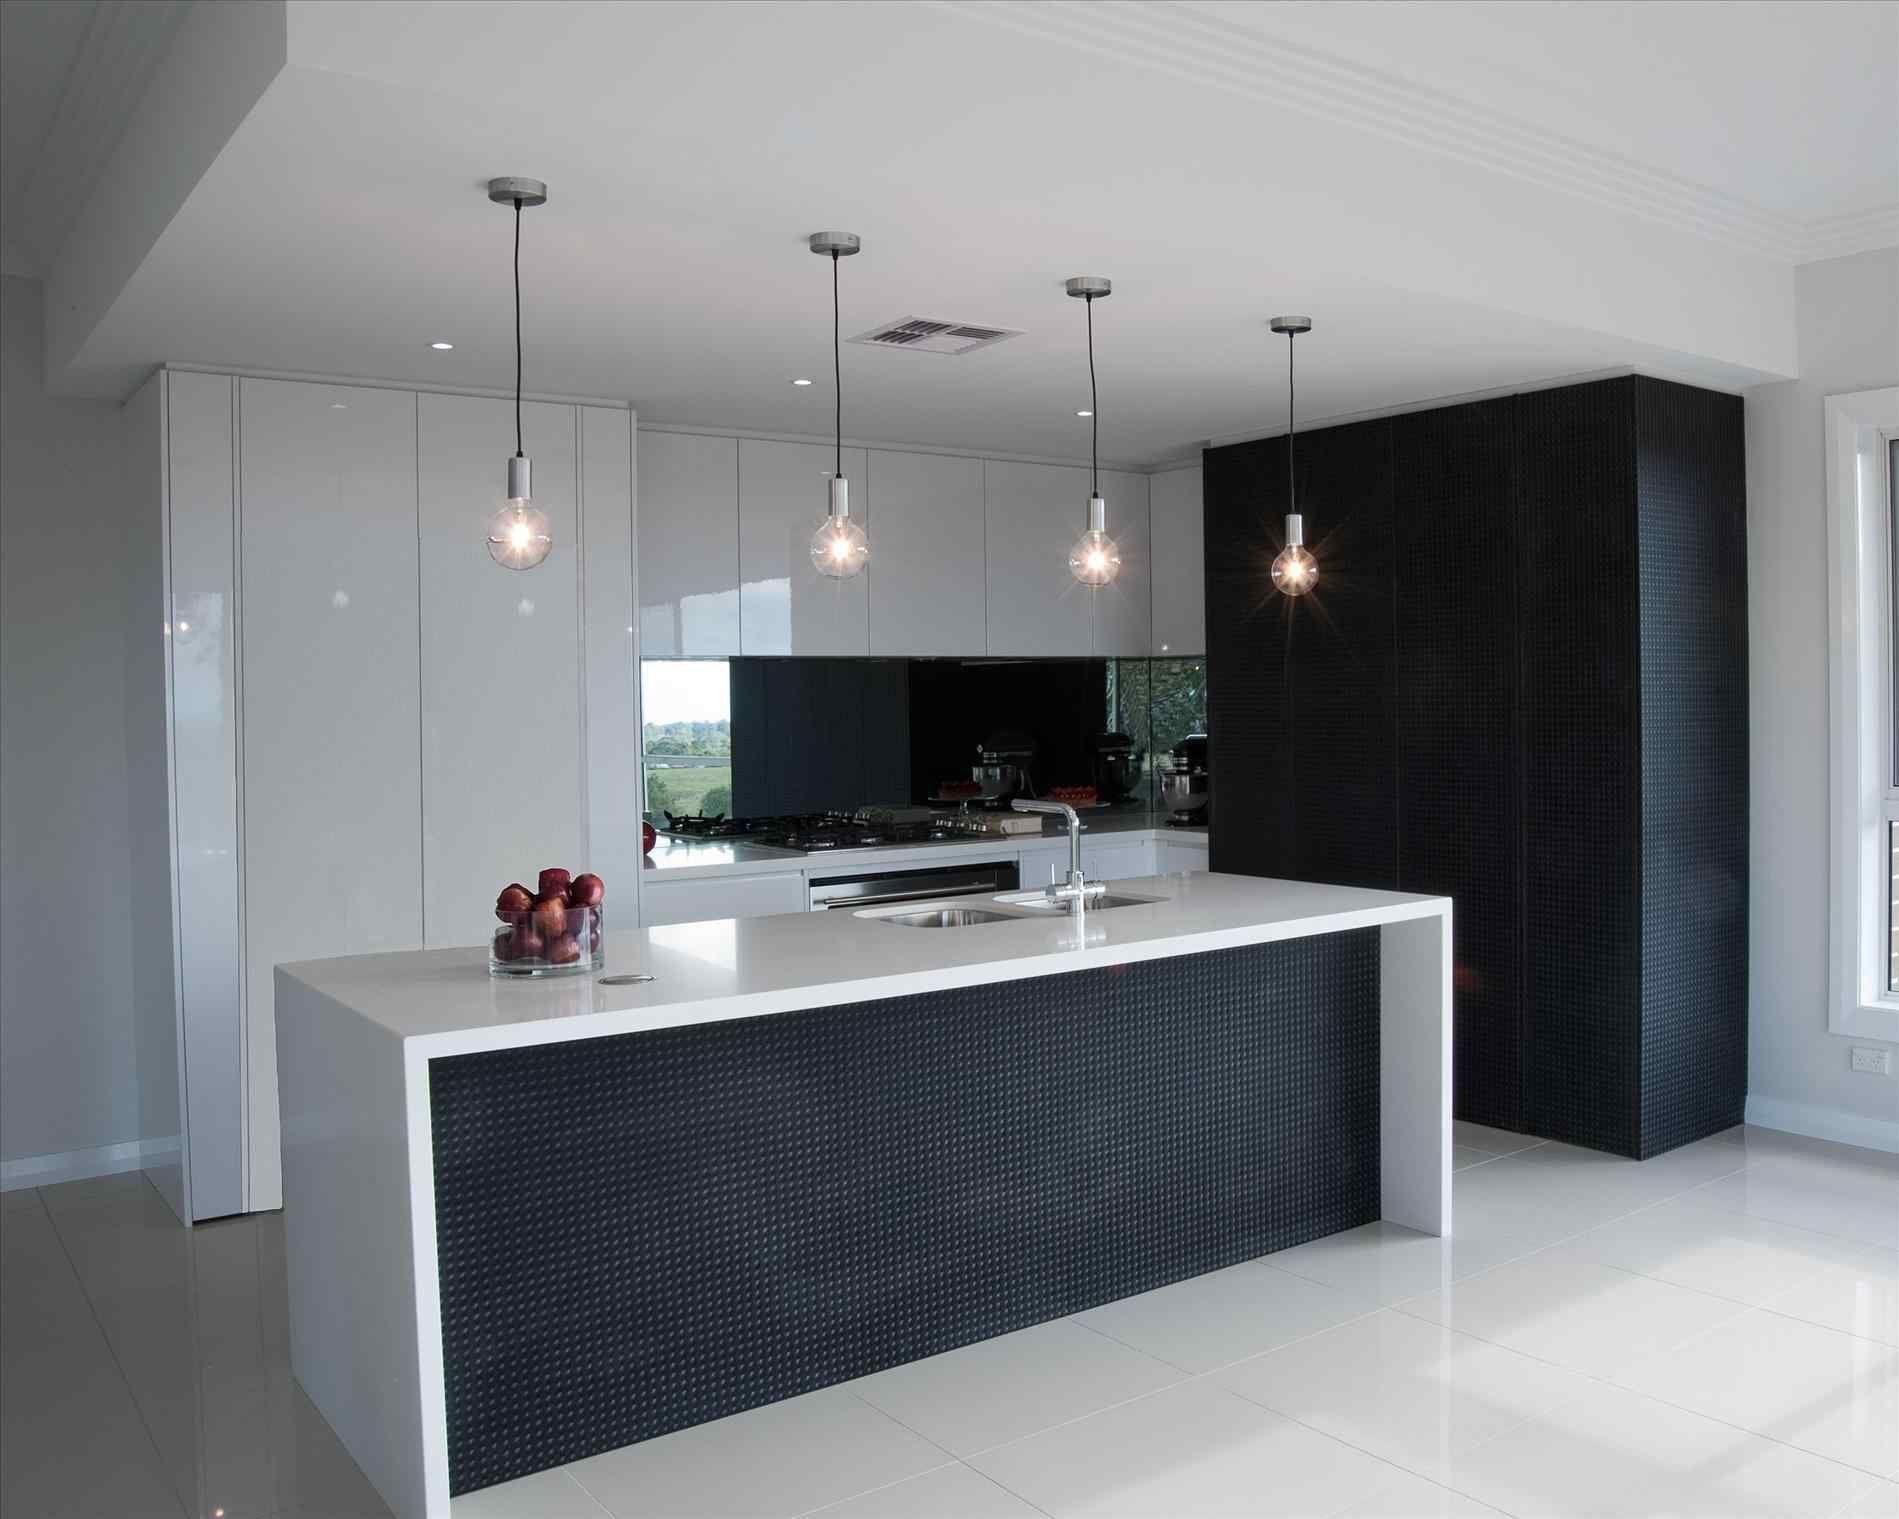 Awesome 13 Black Shiny Kitchen Cabinets Ideas For Stunning Kitchen Black Gloss Kitchen Modern Kitchen Design Black Kitchens